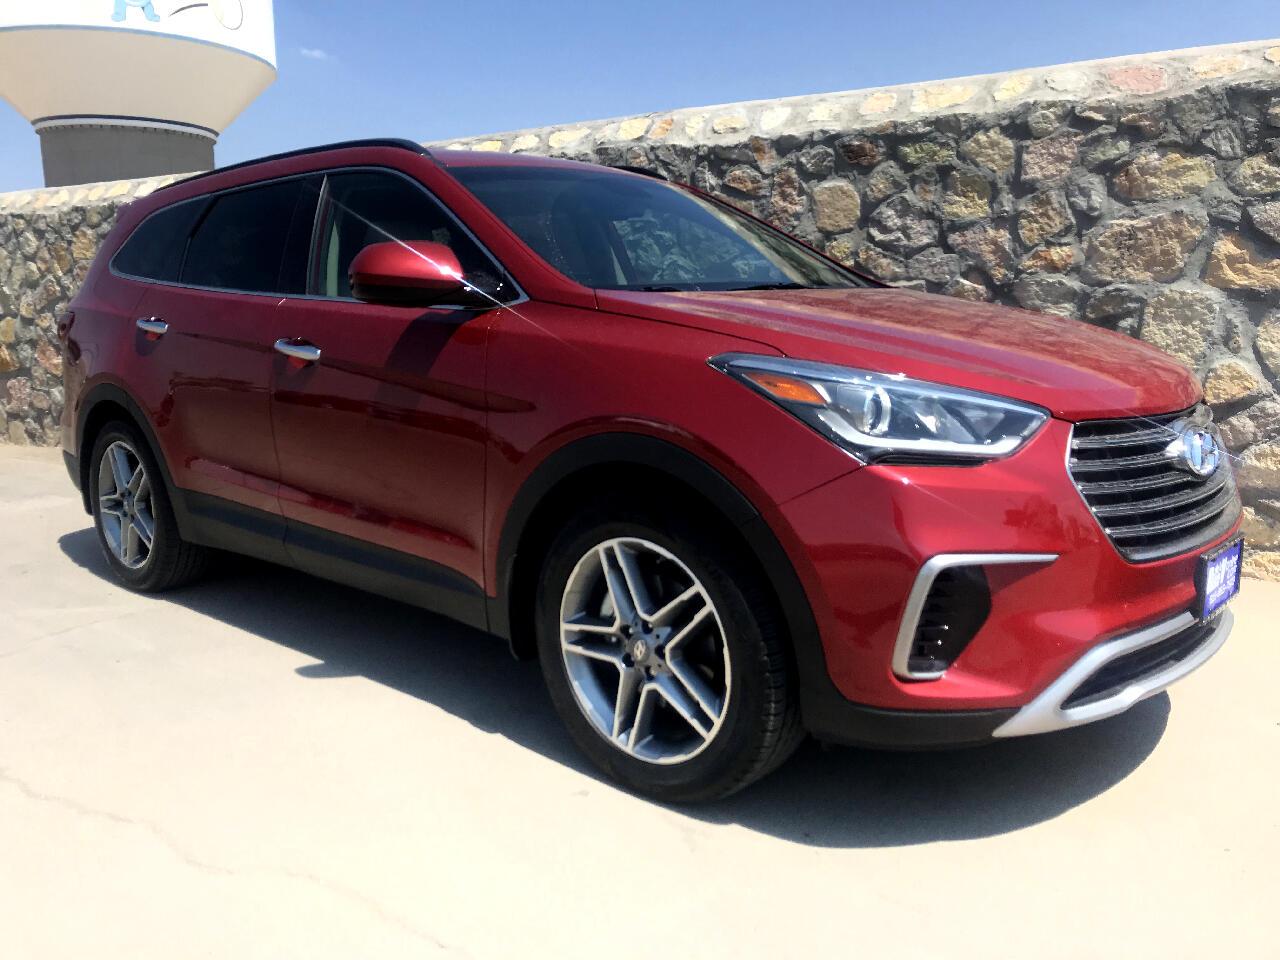 2018 Hyundai Santa Fe SE 3.3L Auto